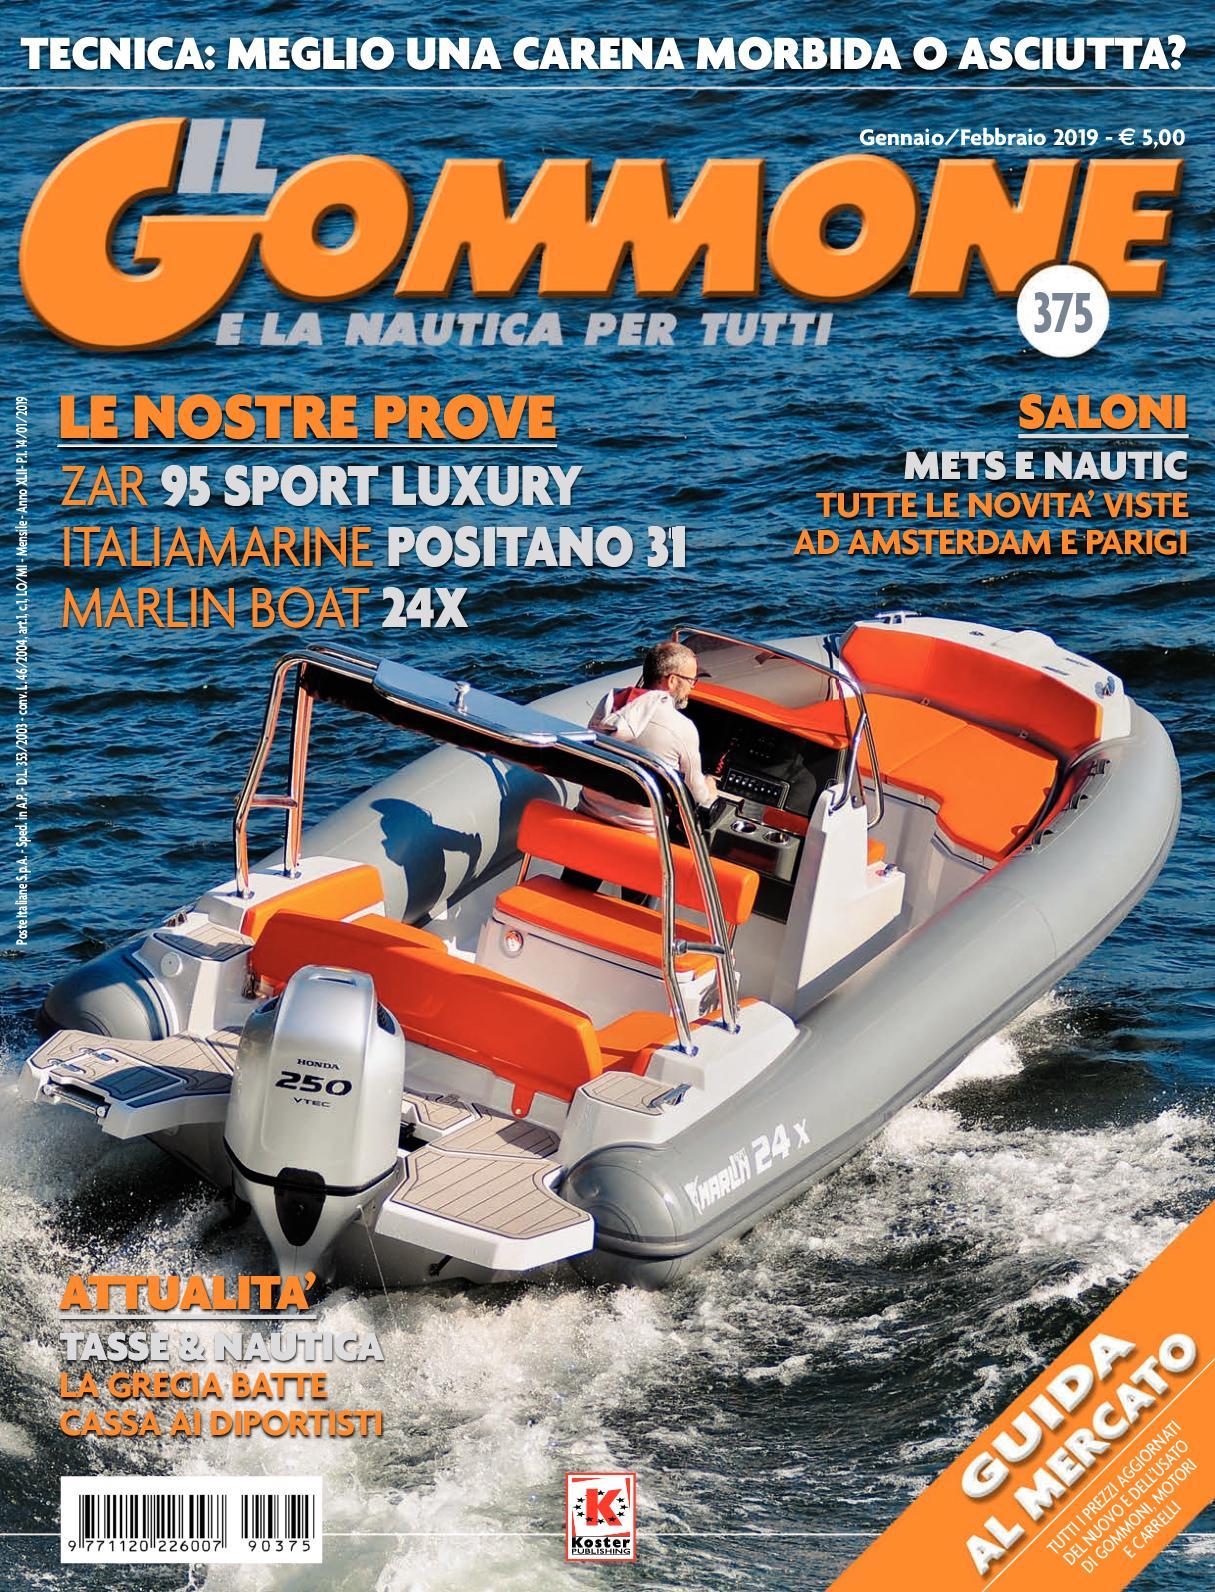 d21b897fd1 Calaméo - Il Gommone n. 375